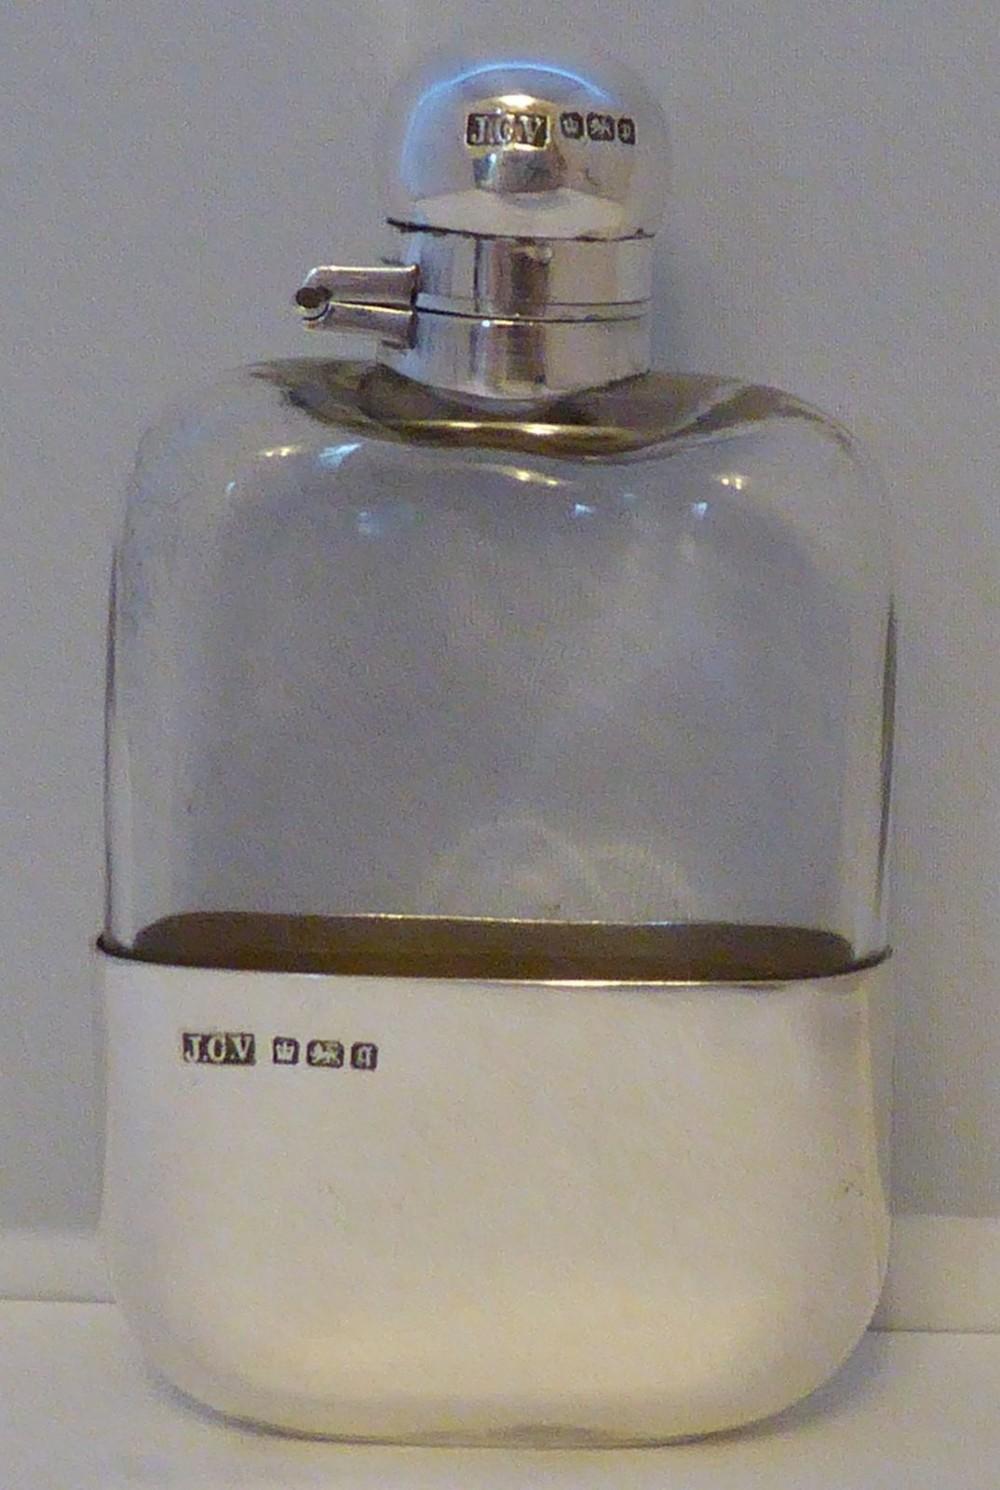 edwardian 1907 solid hallmarked silver hip flask john collard vickery 2 fl oz